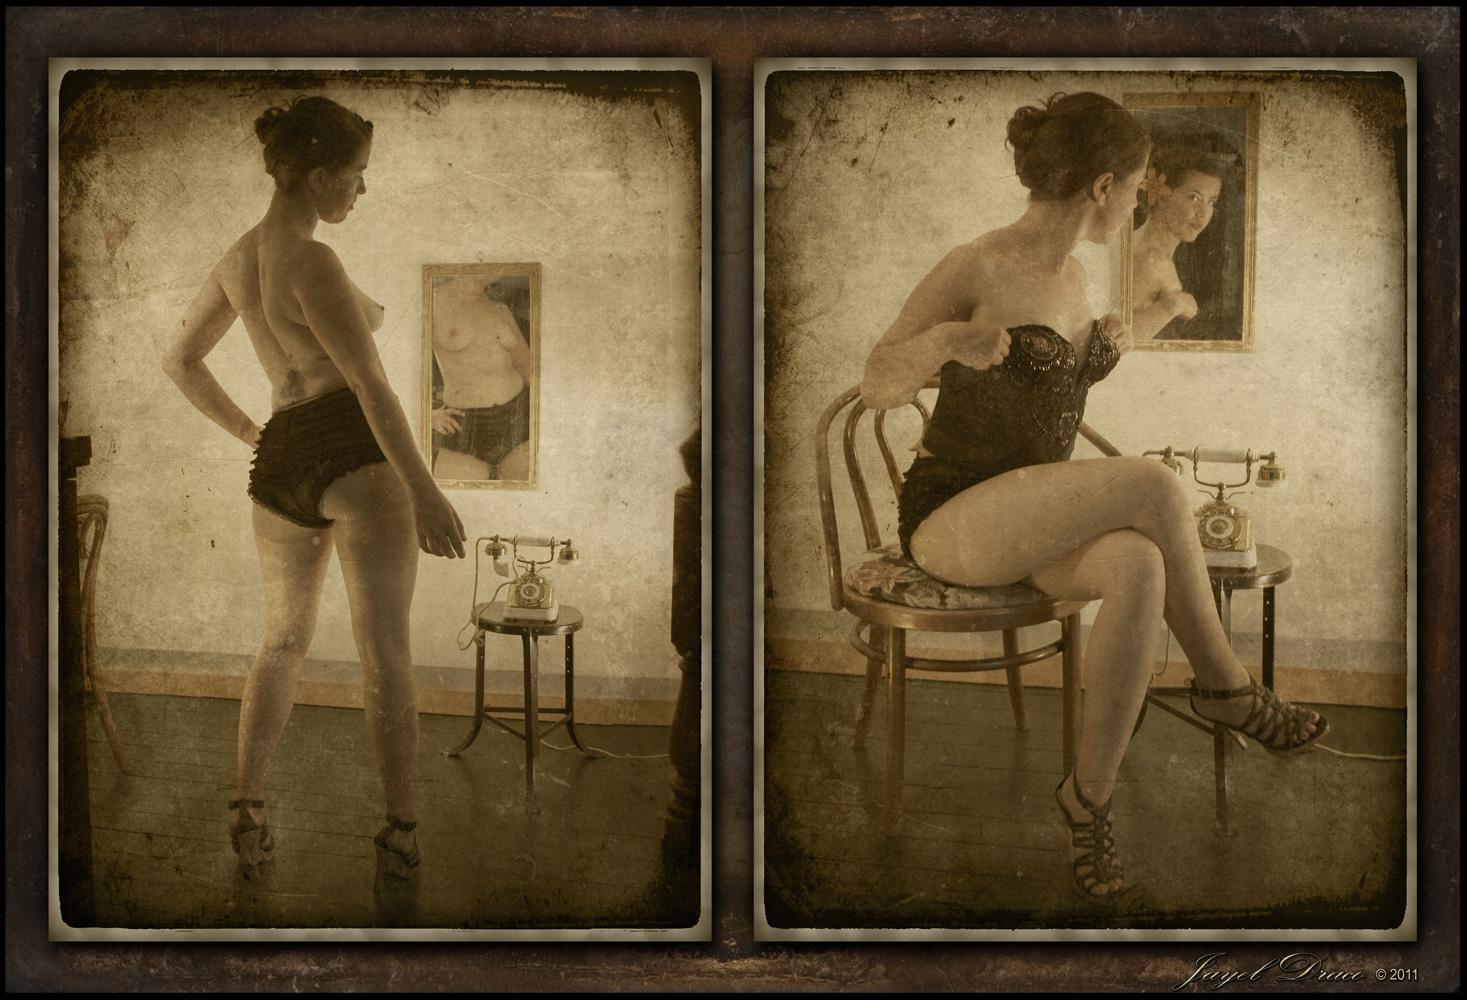 VINTAGE SASS - Photography and Photomanipulation by Jayel Draco